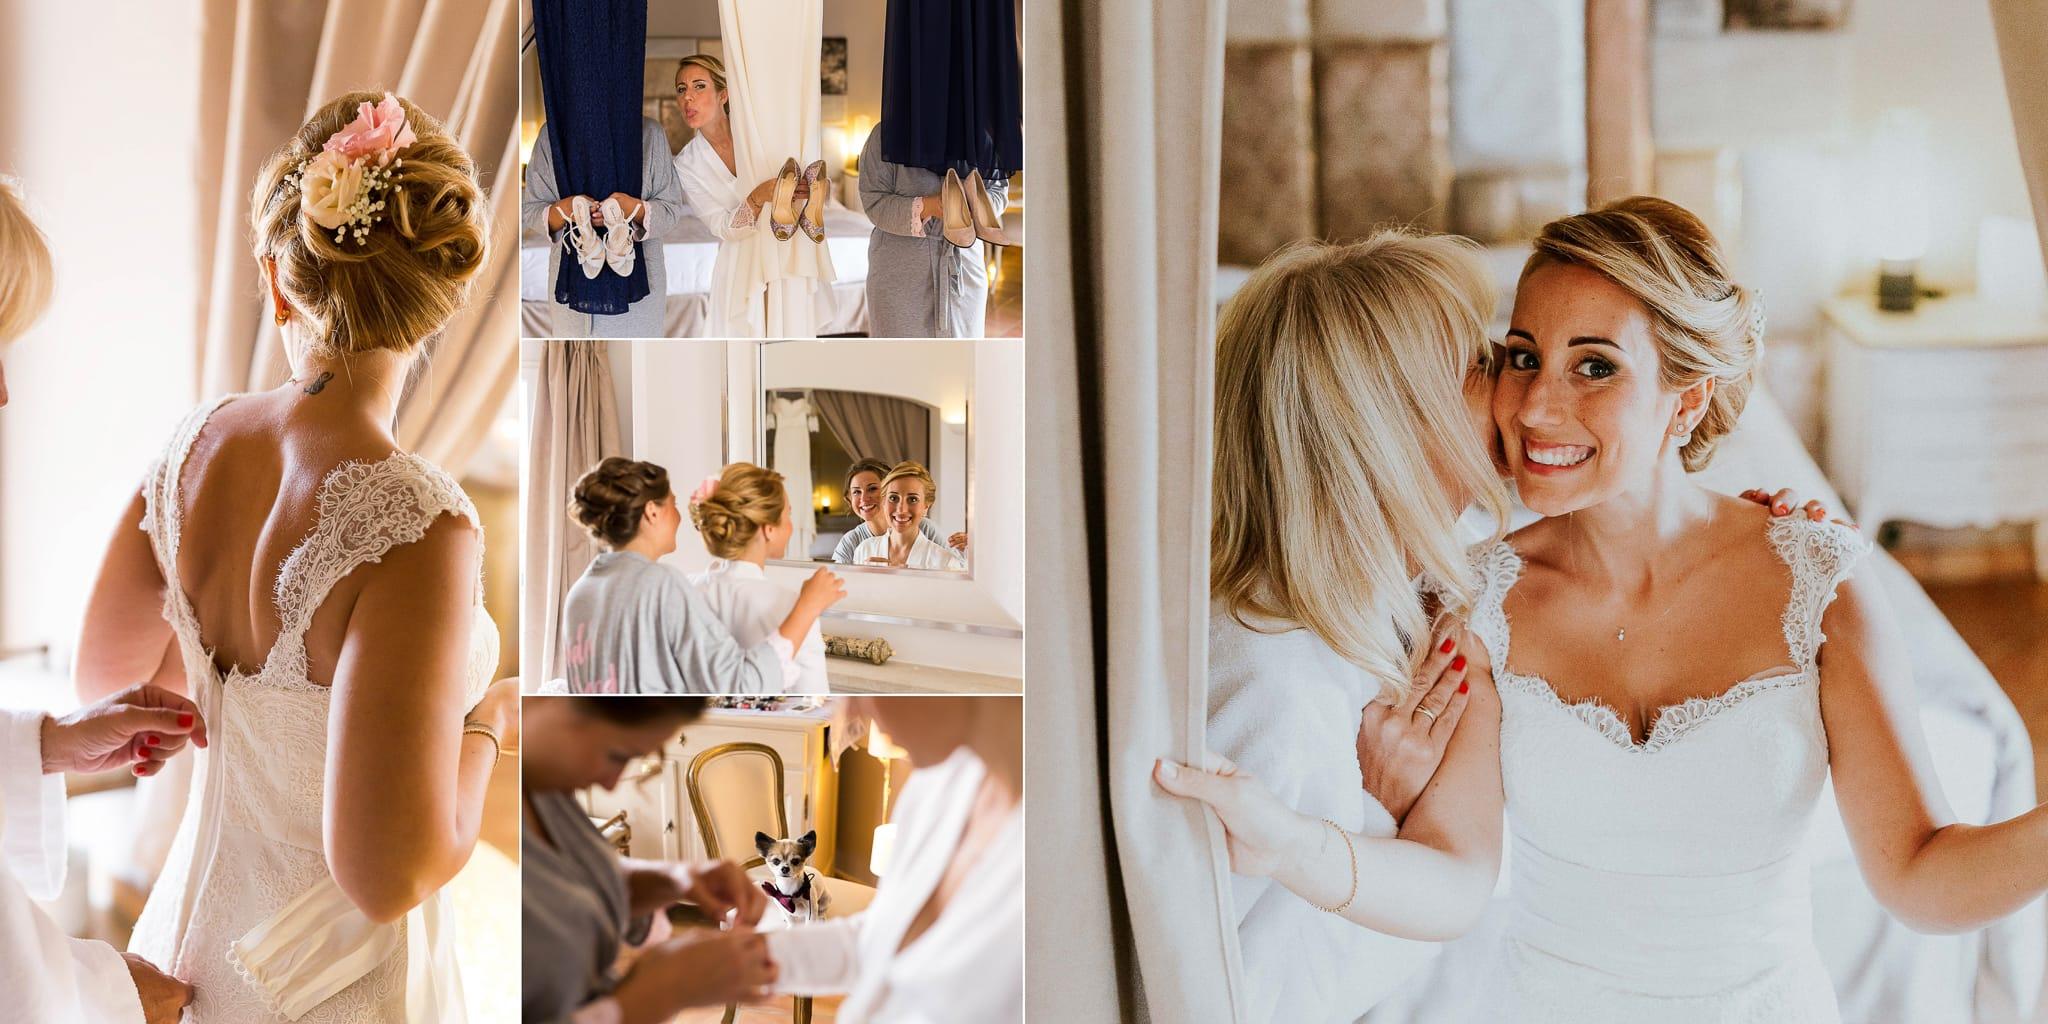 Costi-Moiceanu-Photographer-CM-Photography-Wedding-Mariage-French-Riviera-Cote-D-Azur-Alpes-Maritimes-Weding-Album-Design-6